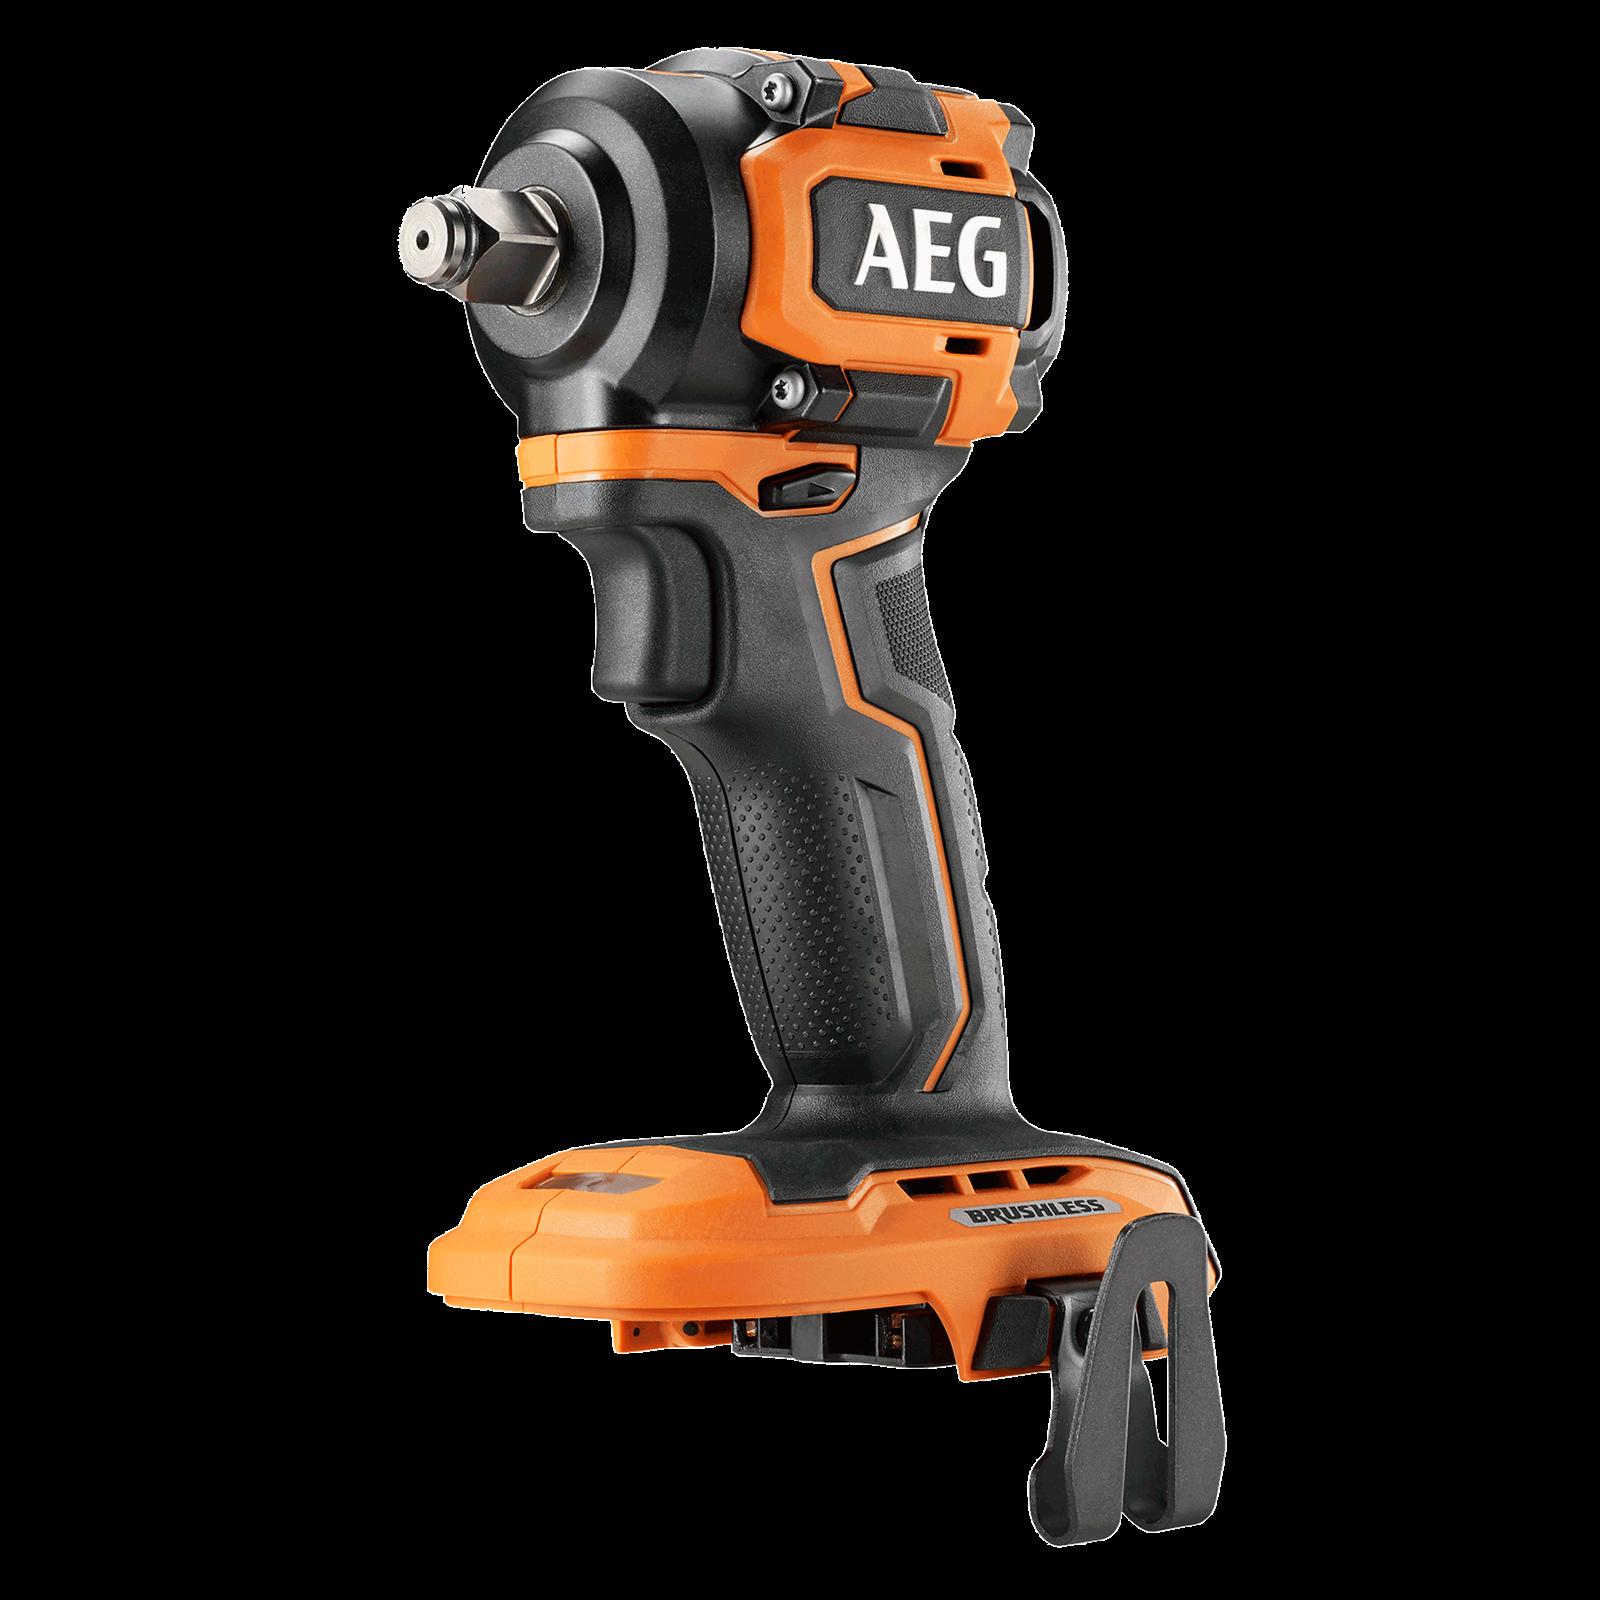 "AEG 18V 1/2"" Brushless Sub Compact 4-Mode Impact Wrench - Skin Only"